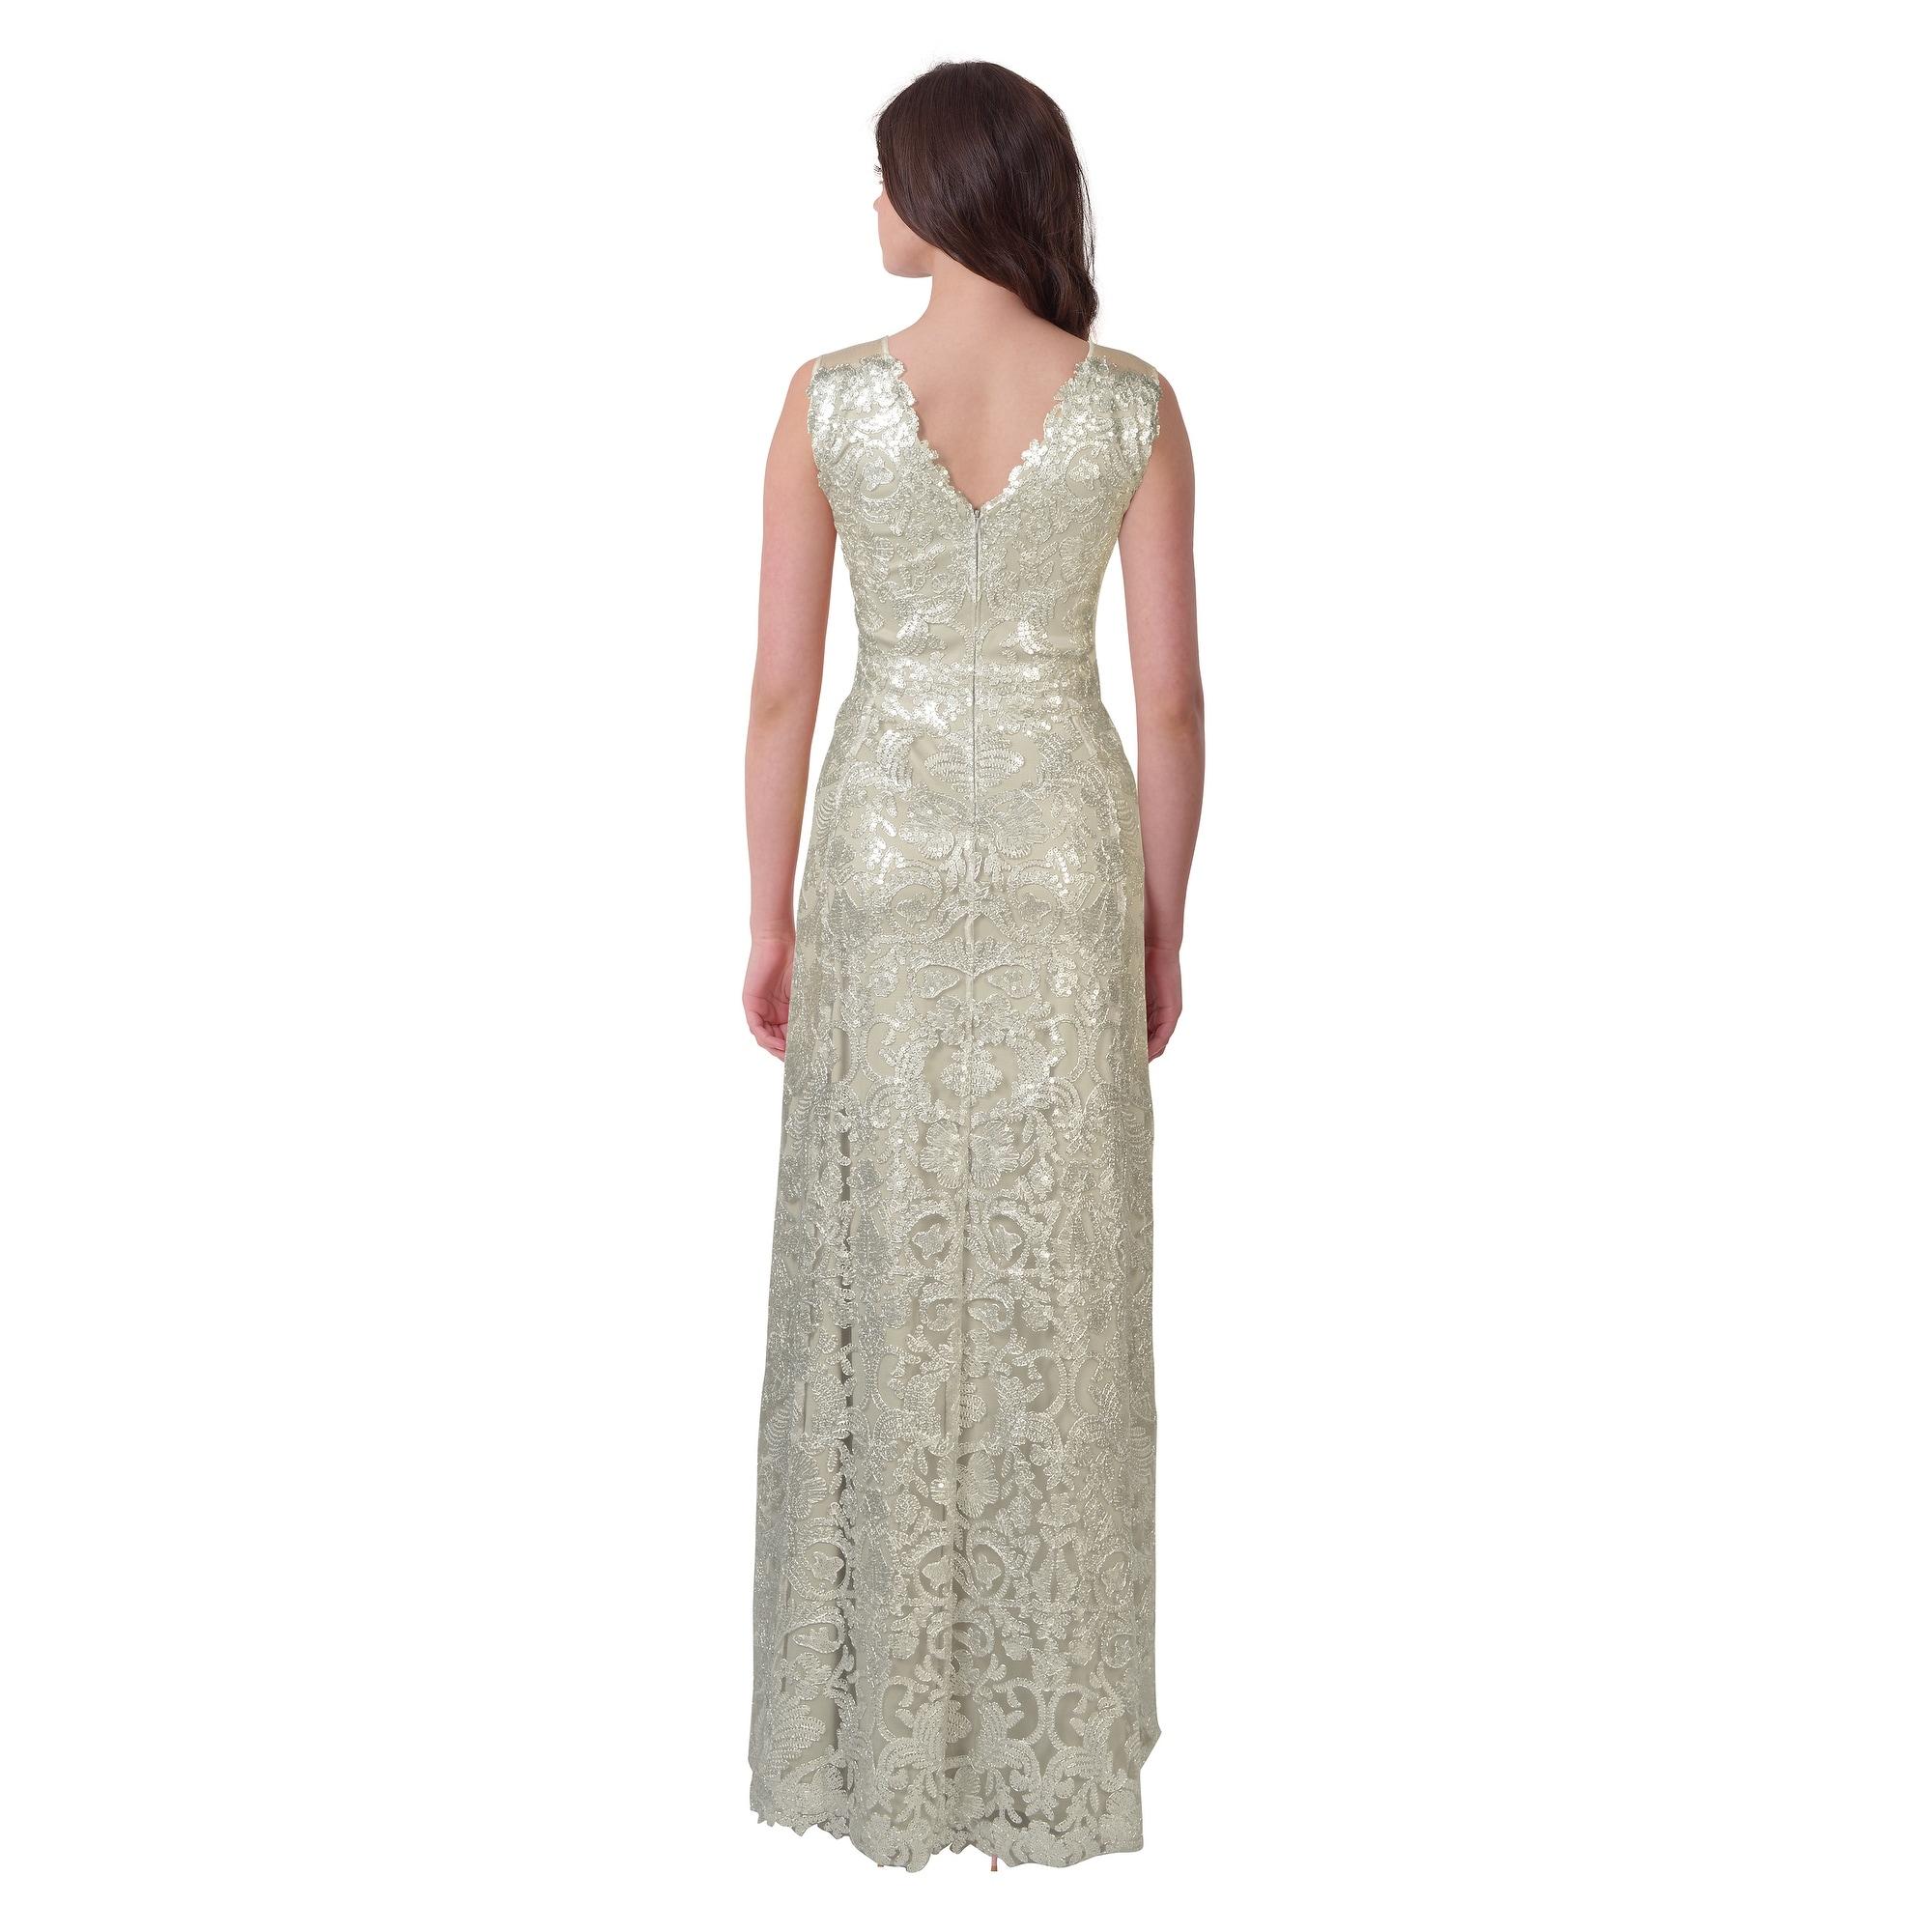 Shop Tadashi Shoji Metallic Embroidered Sequin V-Neck Evening Gown ...